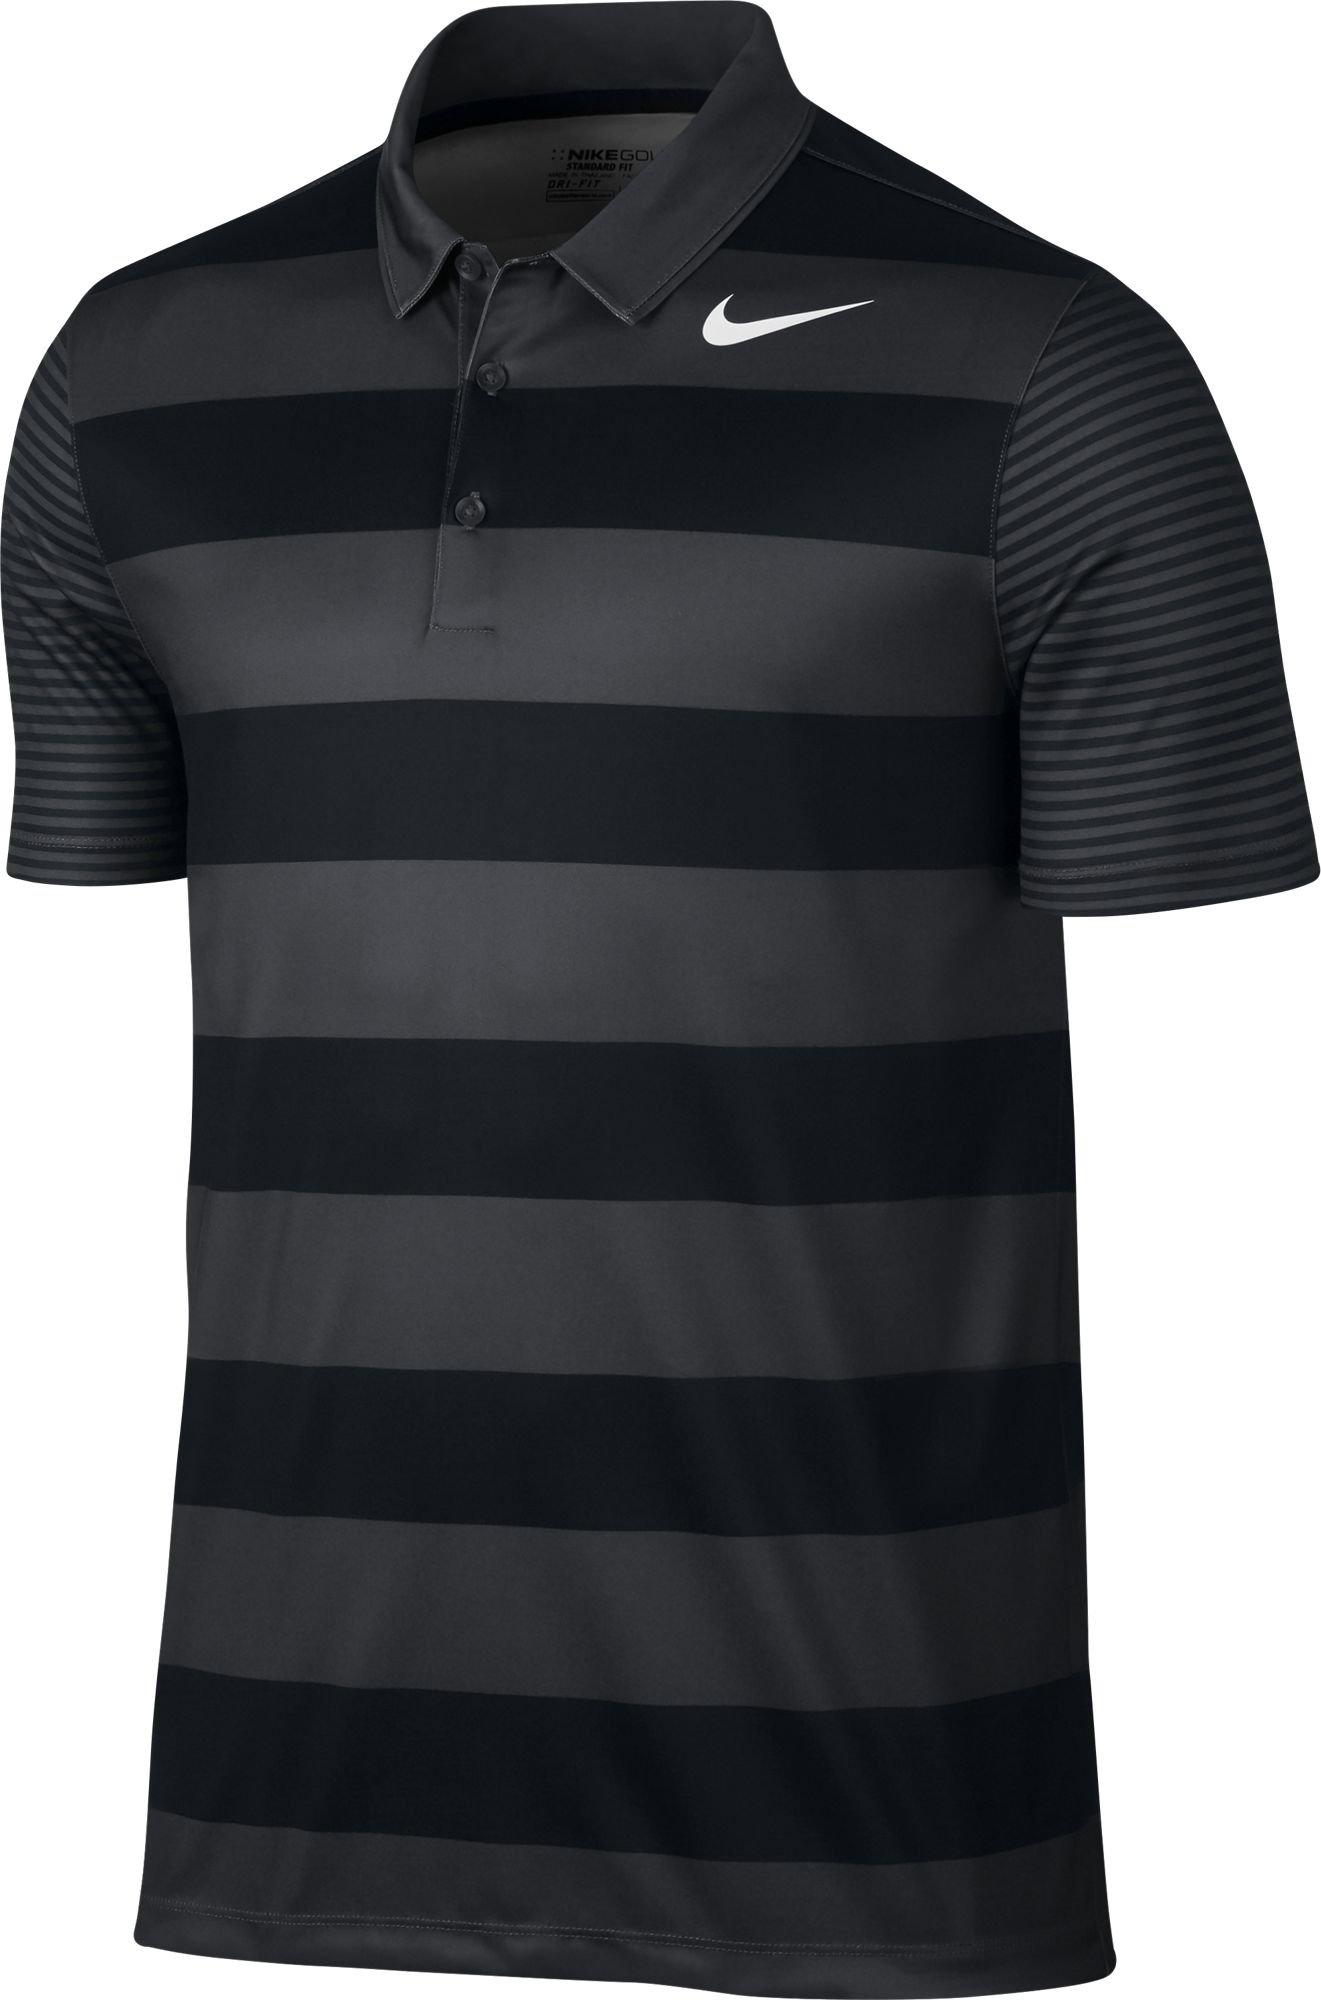 NIKE Men's Dry Bold Stripe Golf Polo (Black/White, Small)